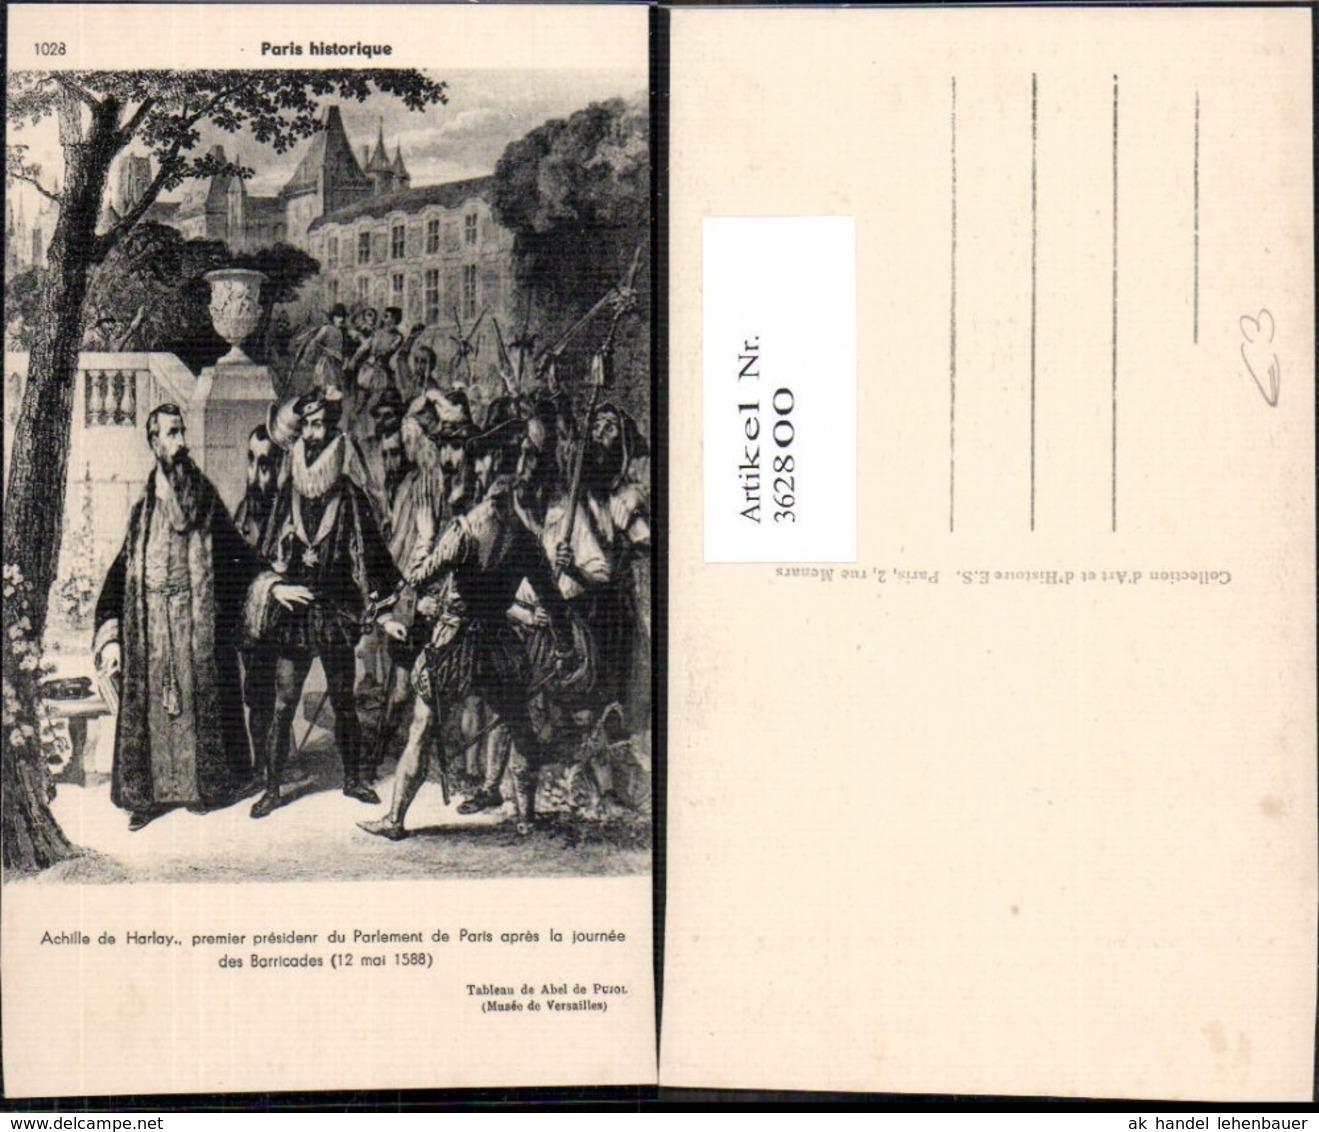 362800,Künstler Ak Achille De Harlay Paris Apres La Journee Des Barricades 1588 - Geschichte